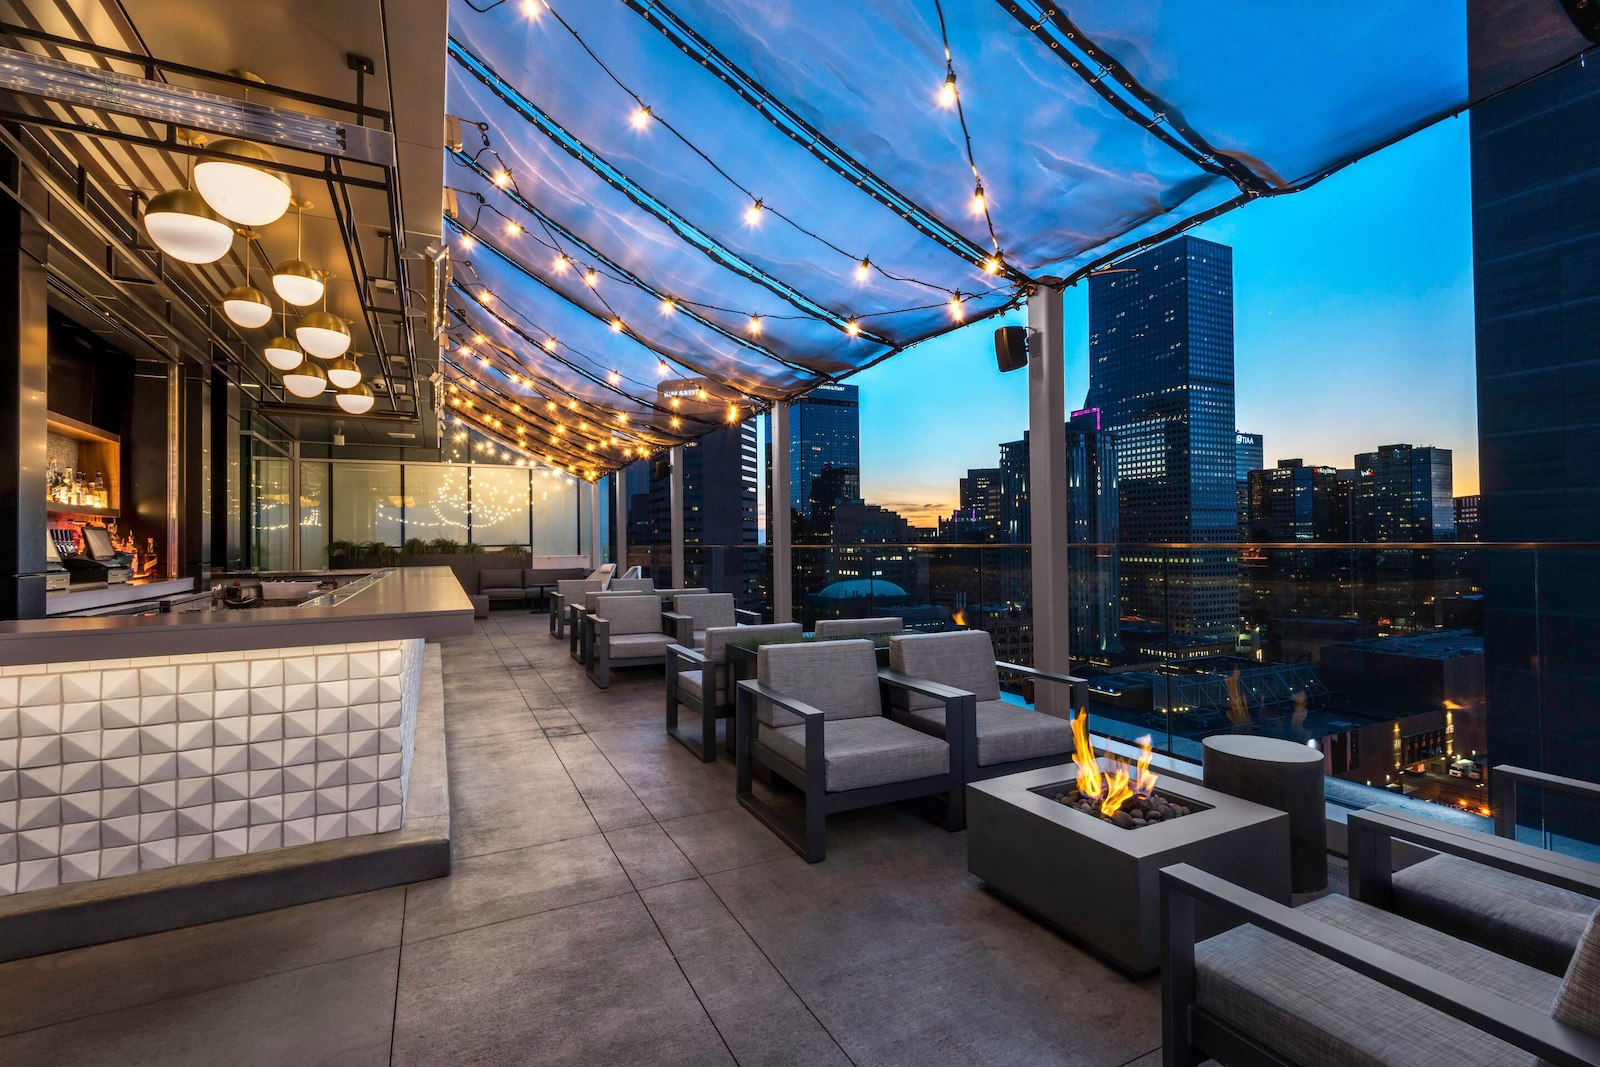 Image of 54thirty Rooftop bar at Le Meridien in Denver, Colorado